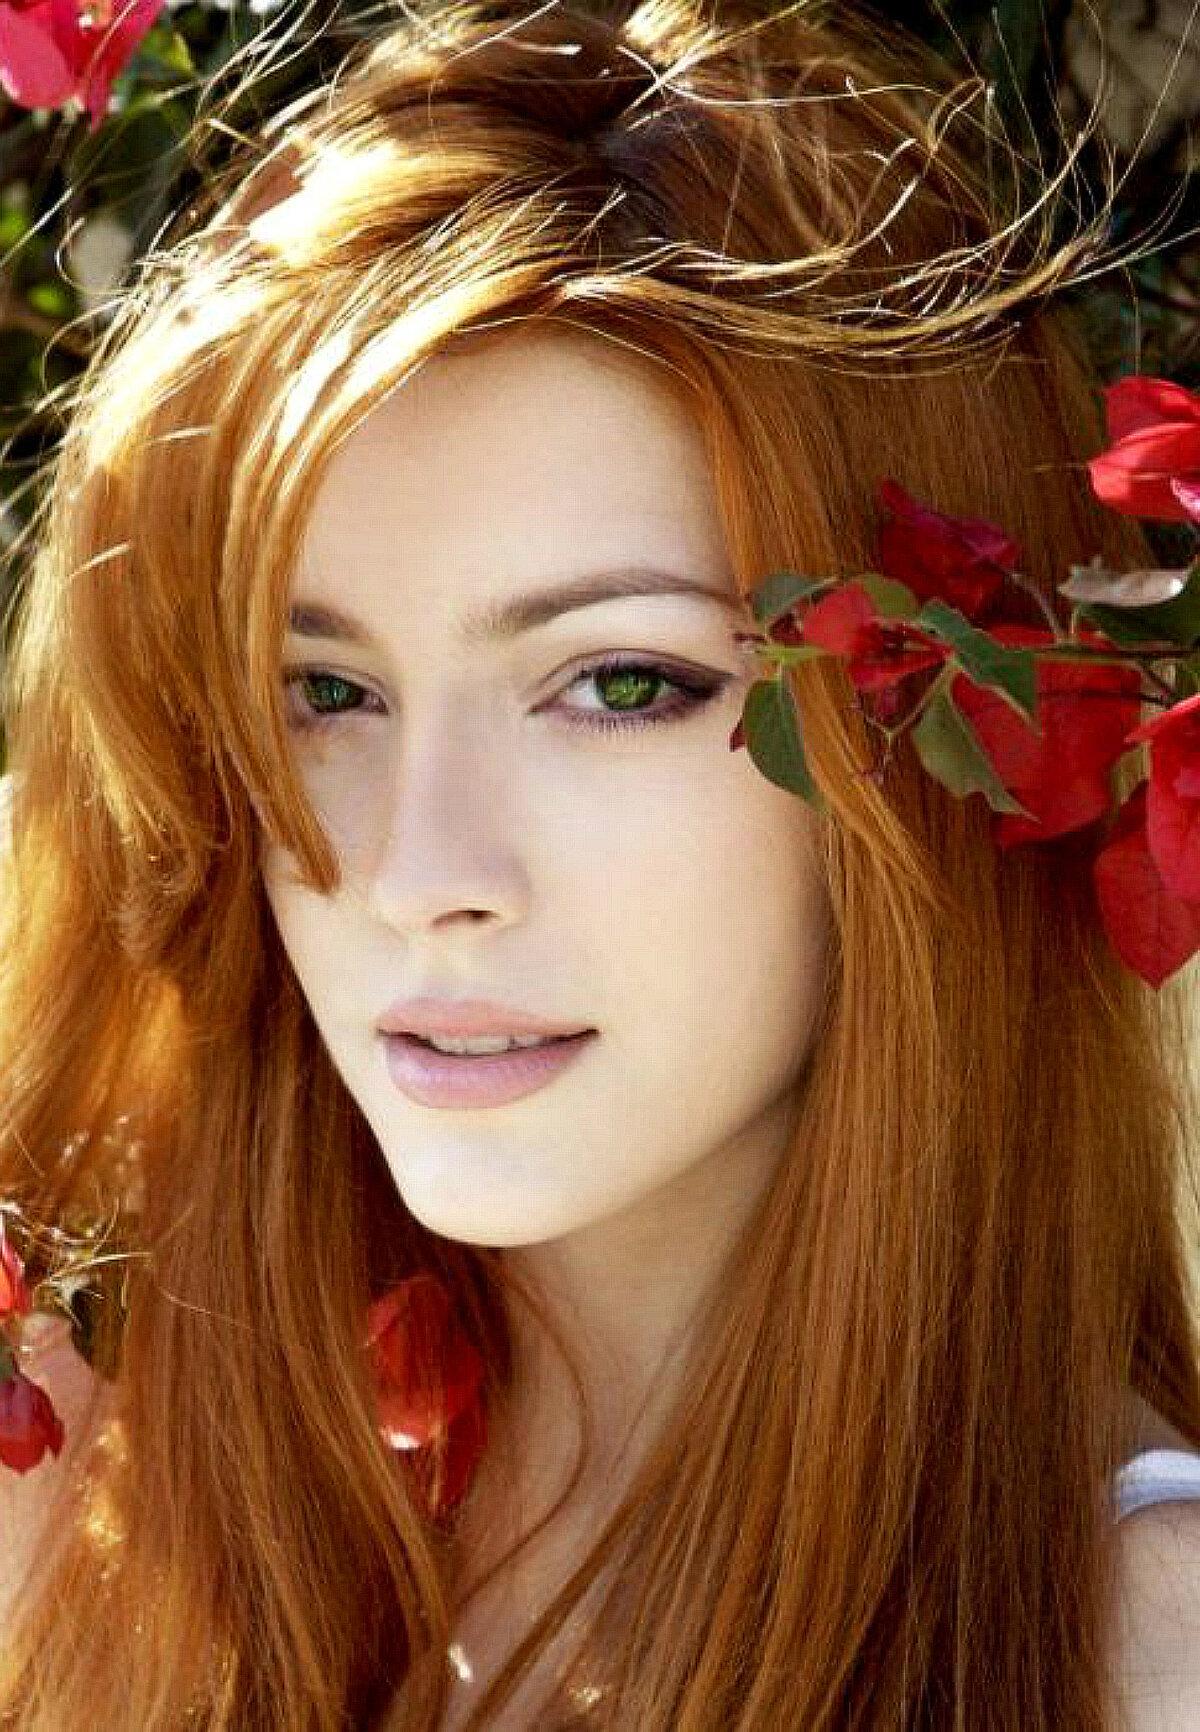 redhead-jew-anal-sex-perminant-damage